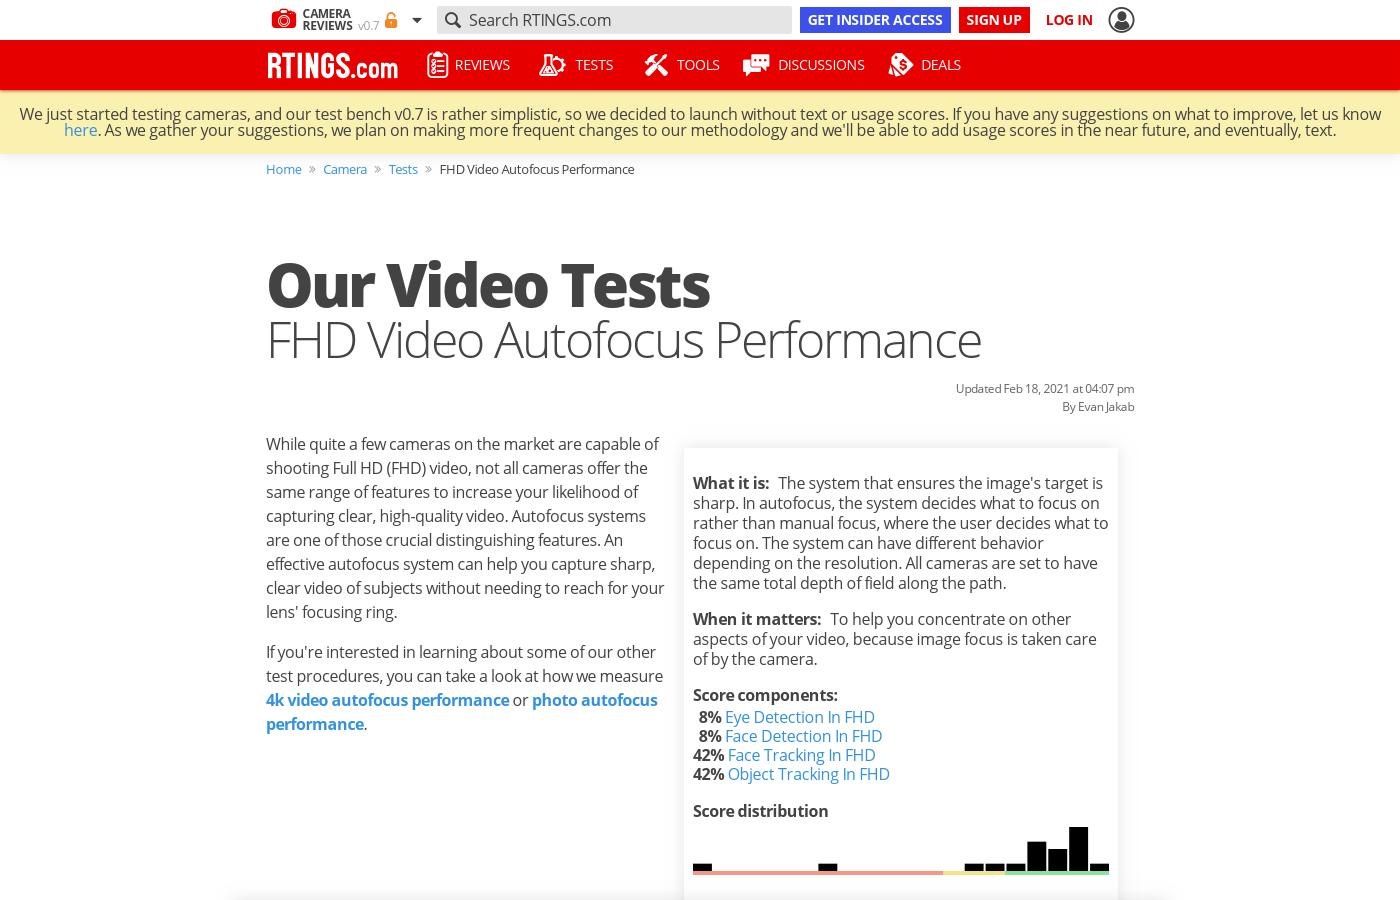 Test Article: FHD Video Autofocus Performance